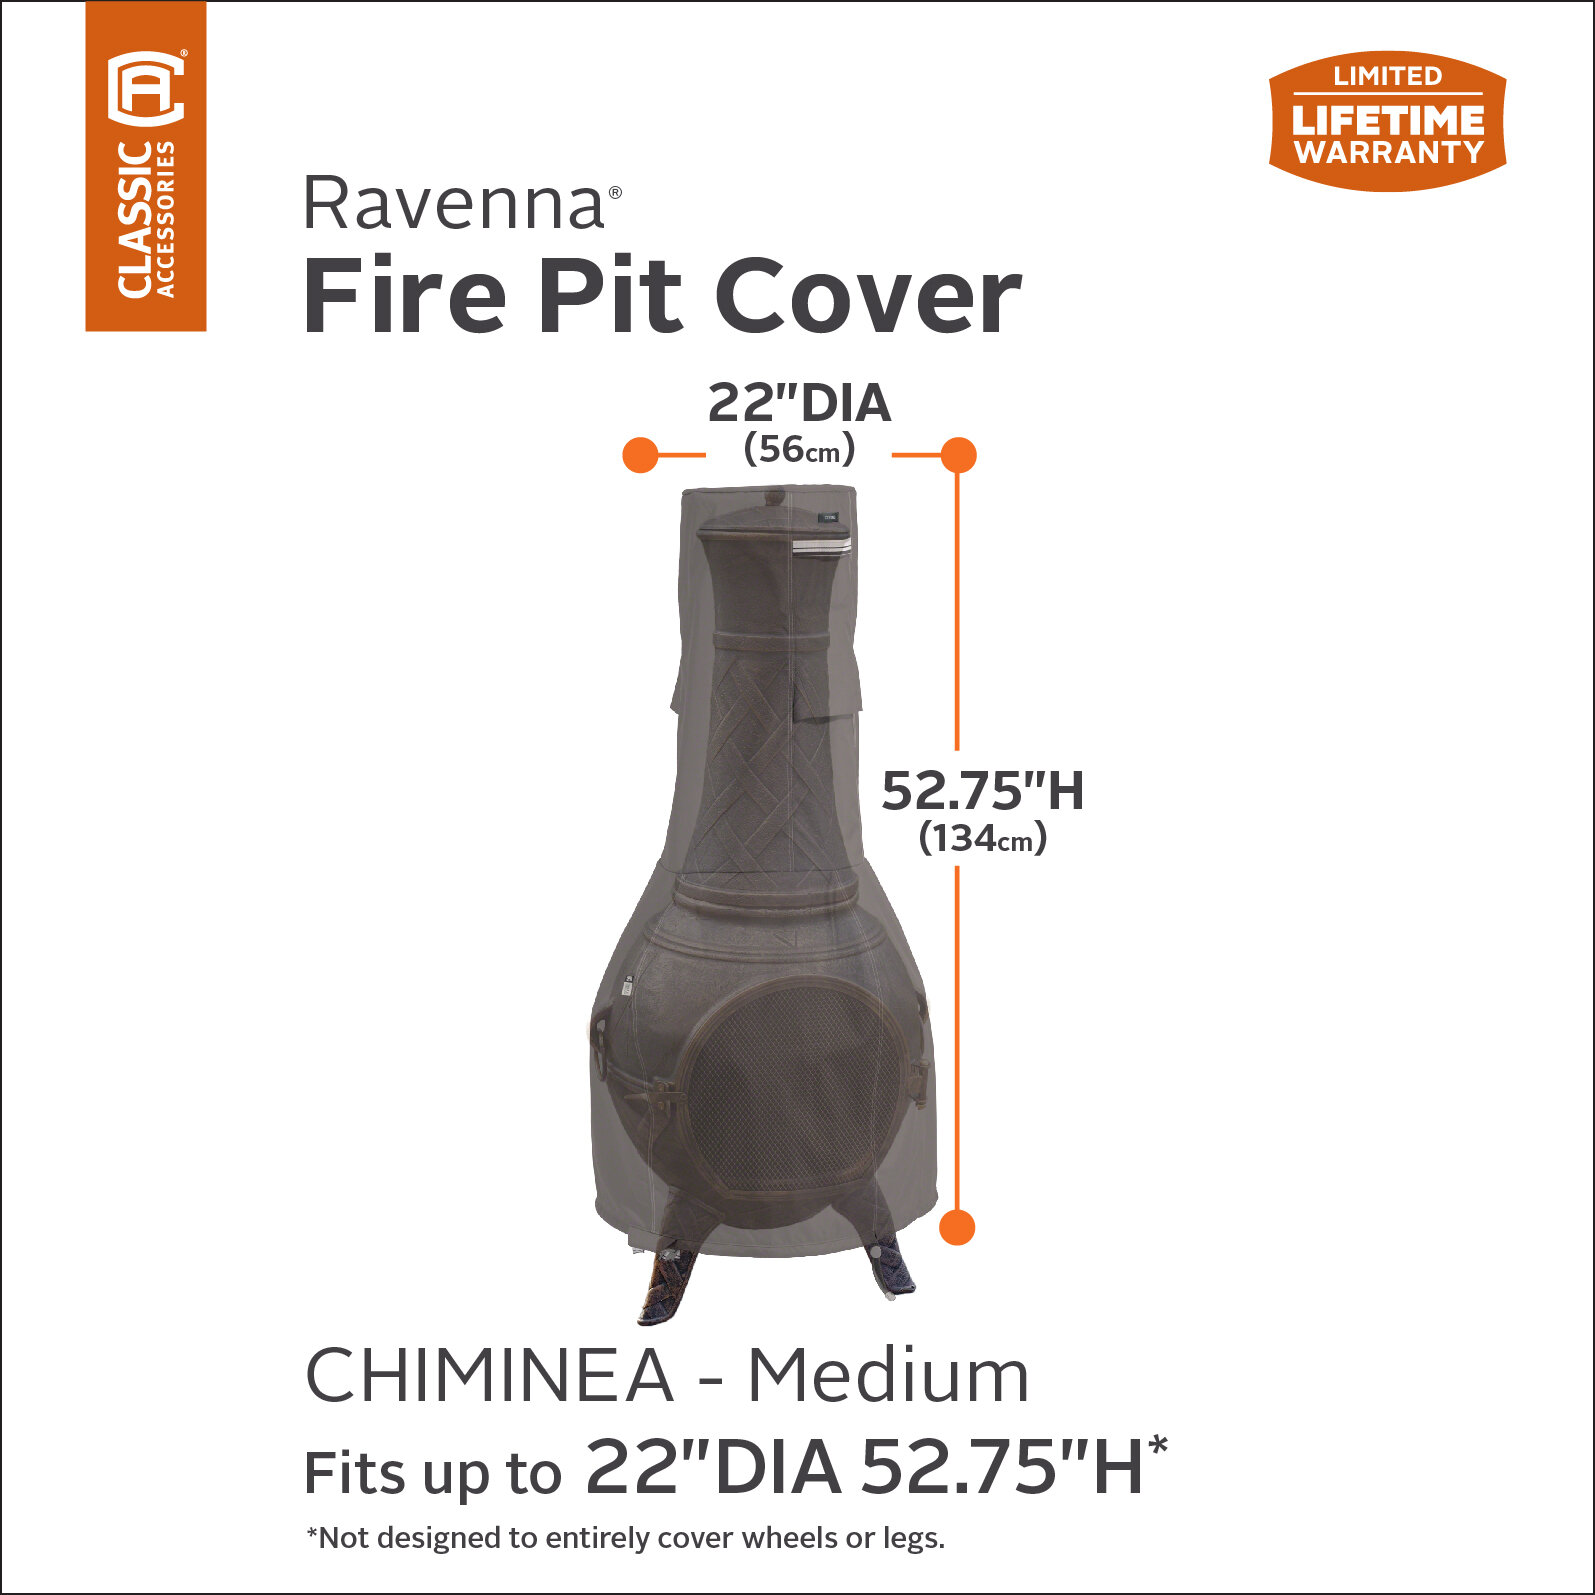 Freeport Park Outdoor Chiminea Patio Heater Cover